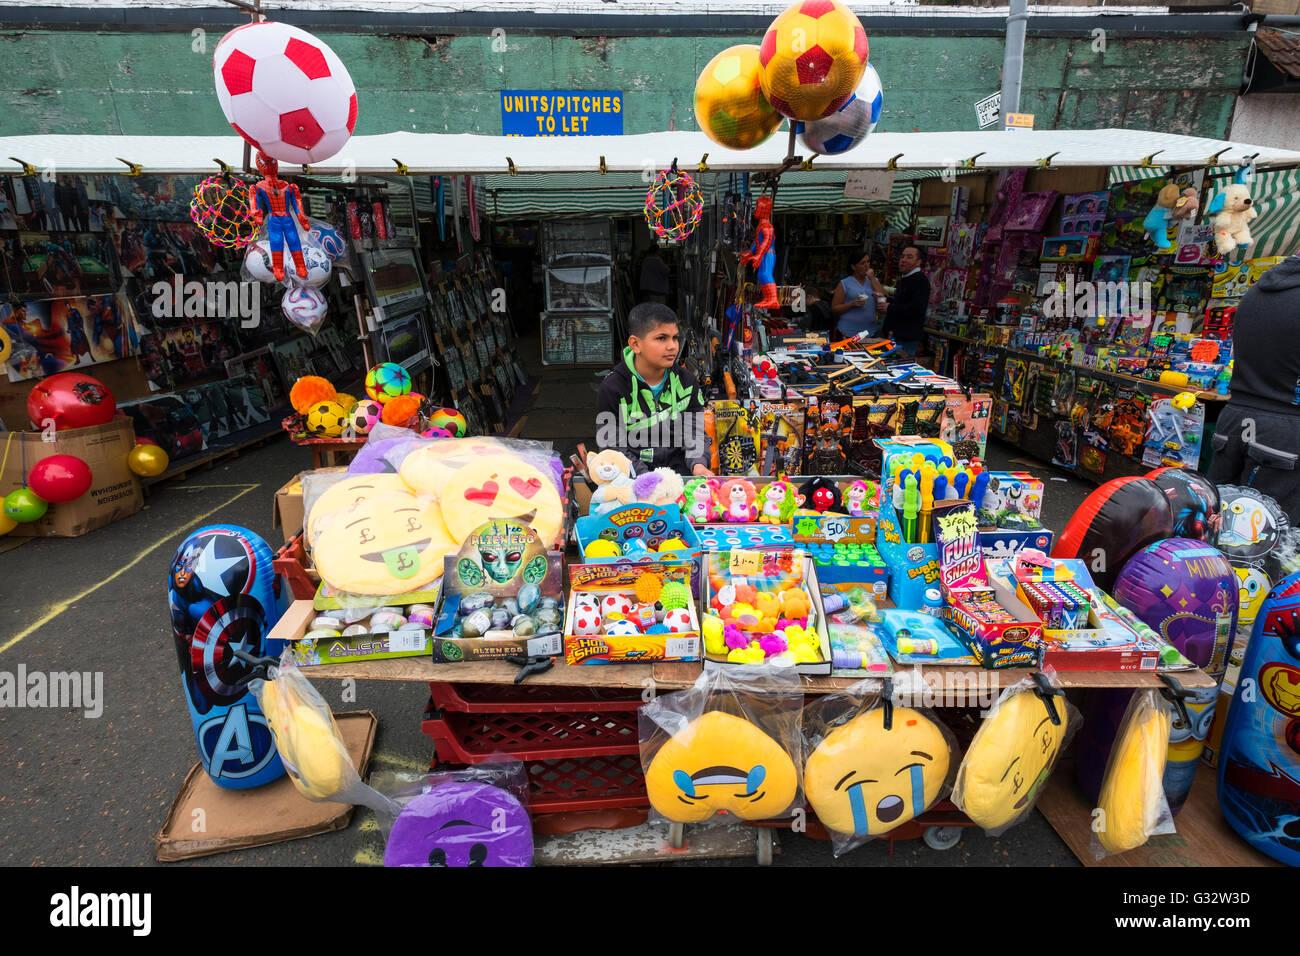 Toys Market Stall 16